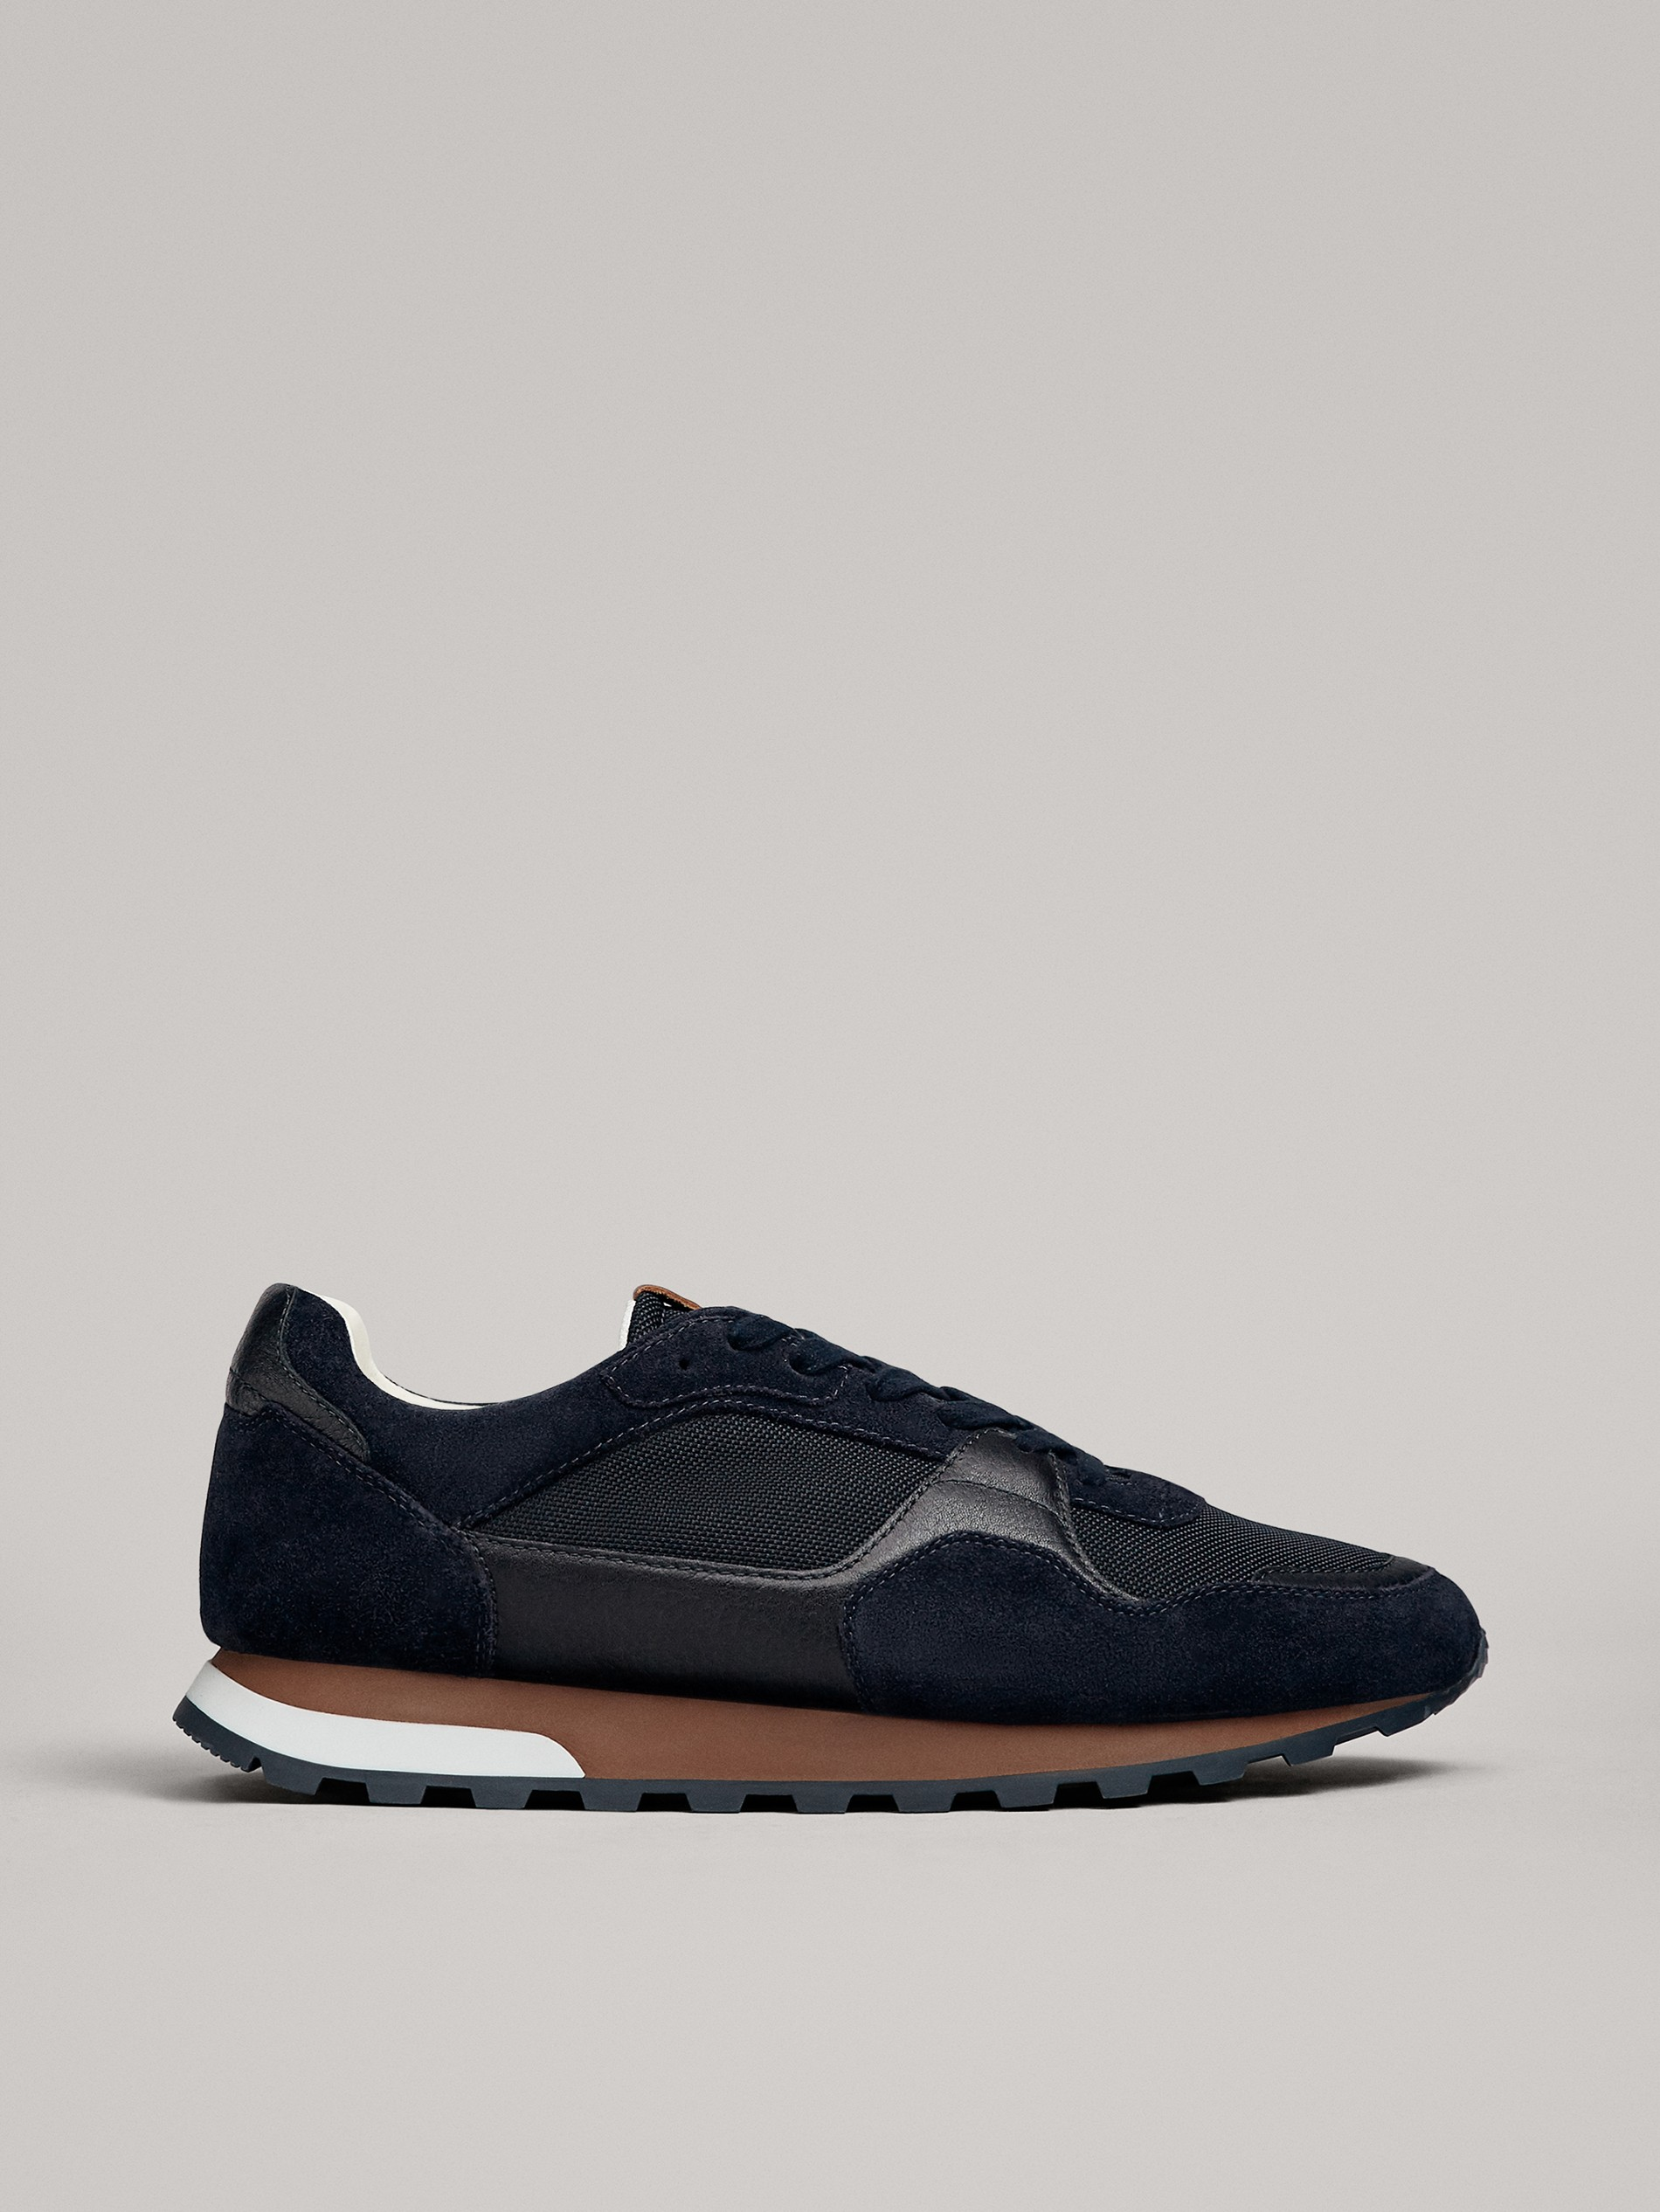 massimo dutti men's shoes sale